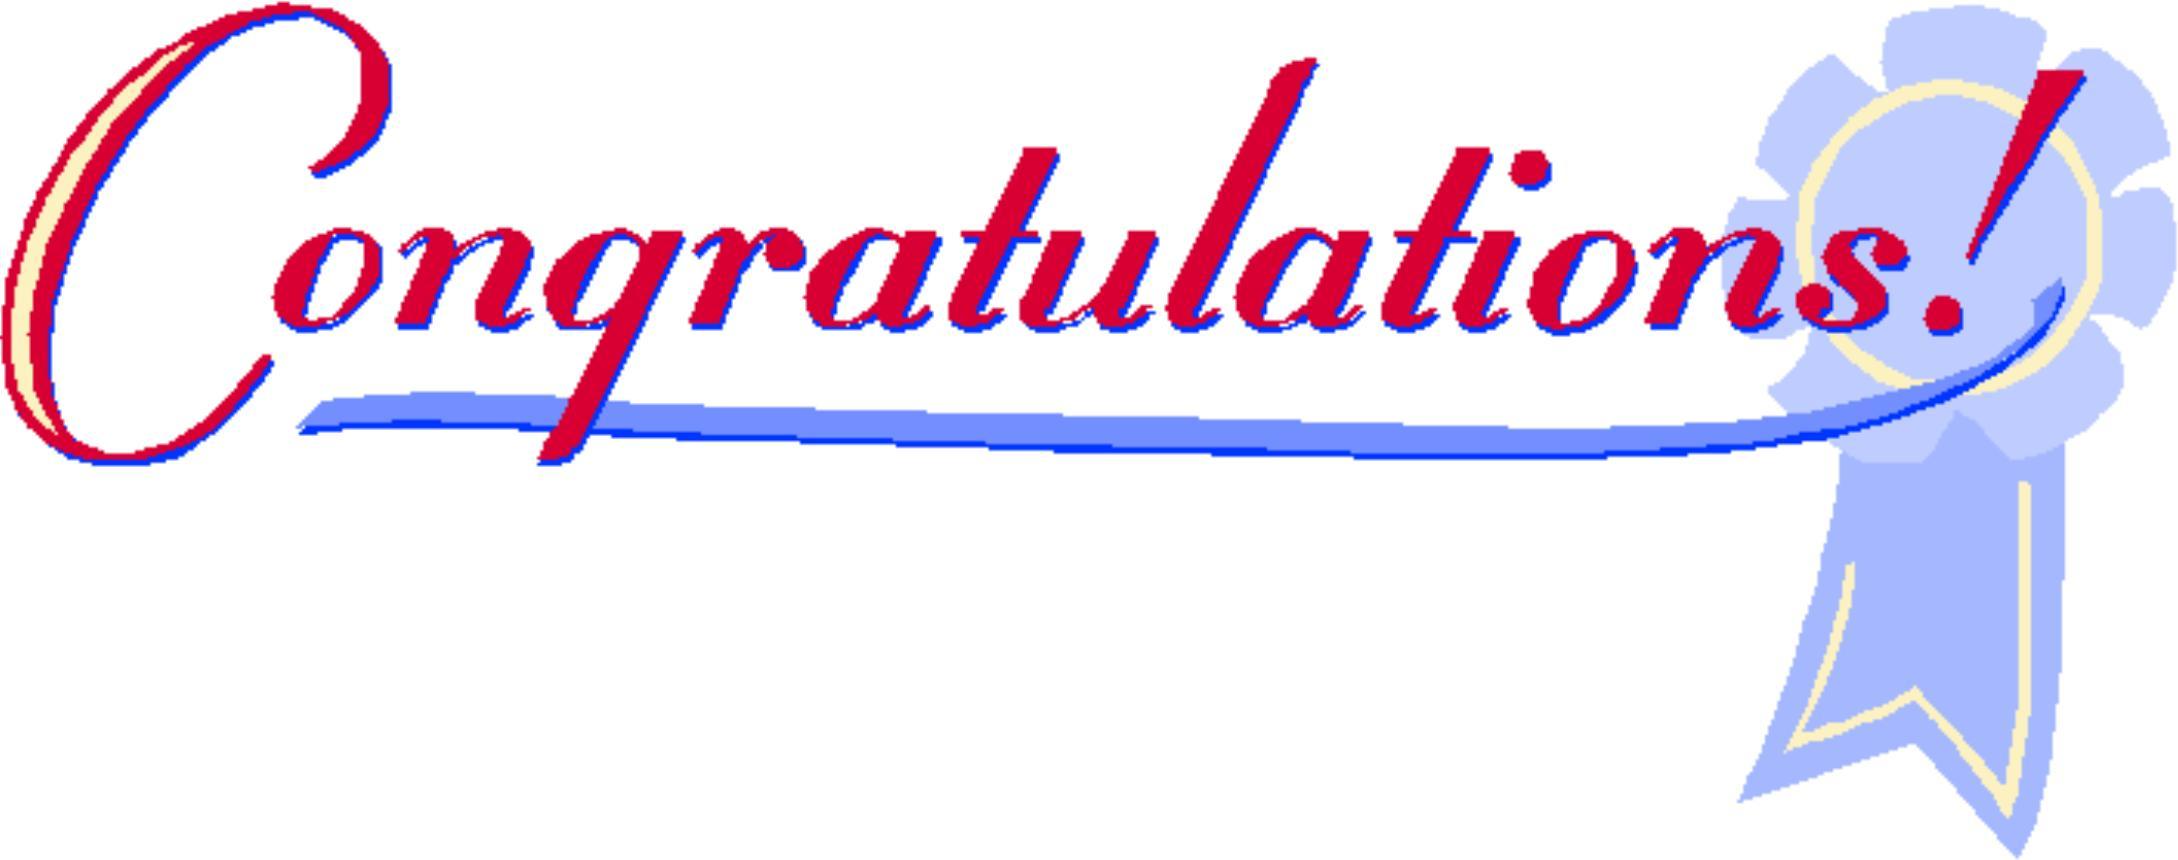 Applause clipart congratulation. Congratulations fancy design clip